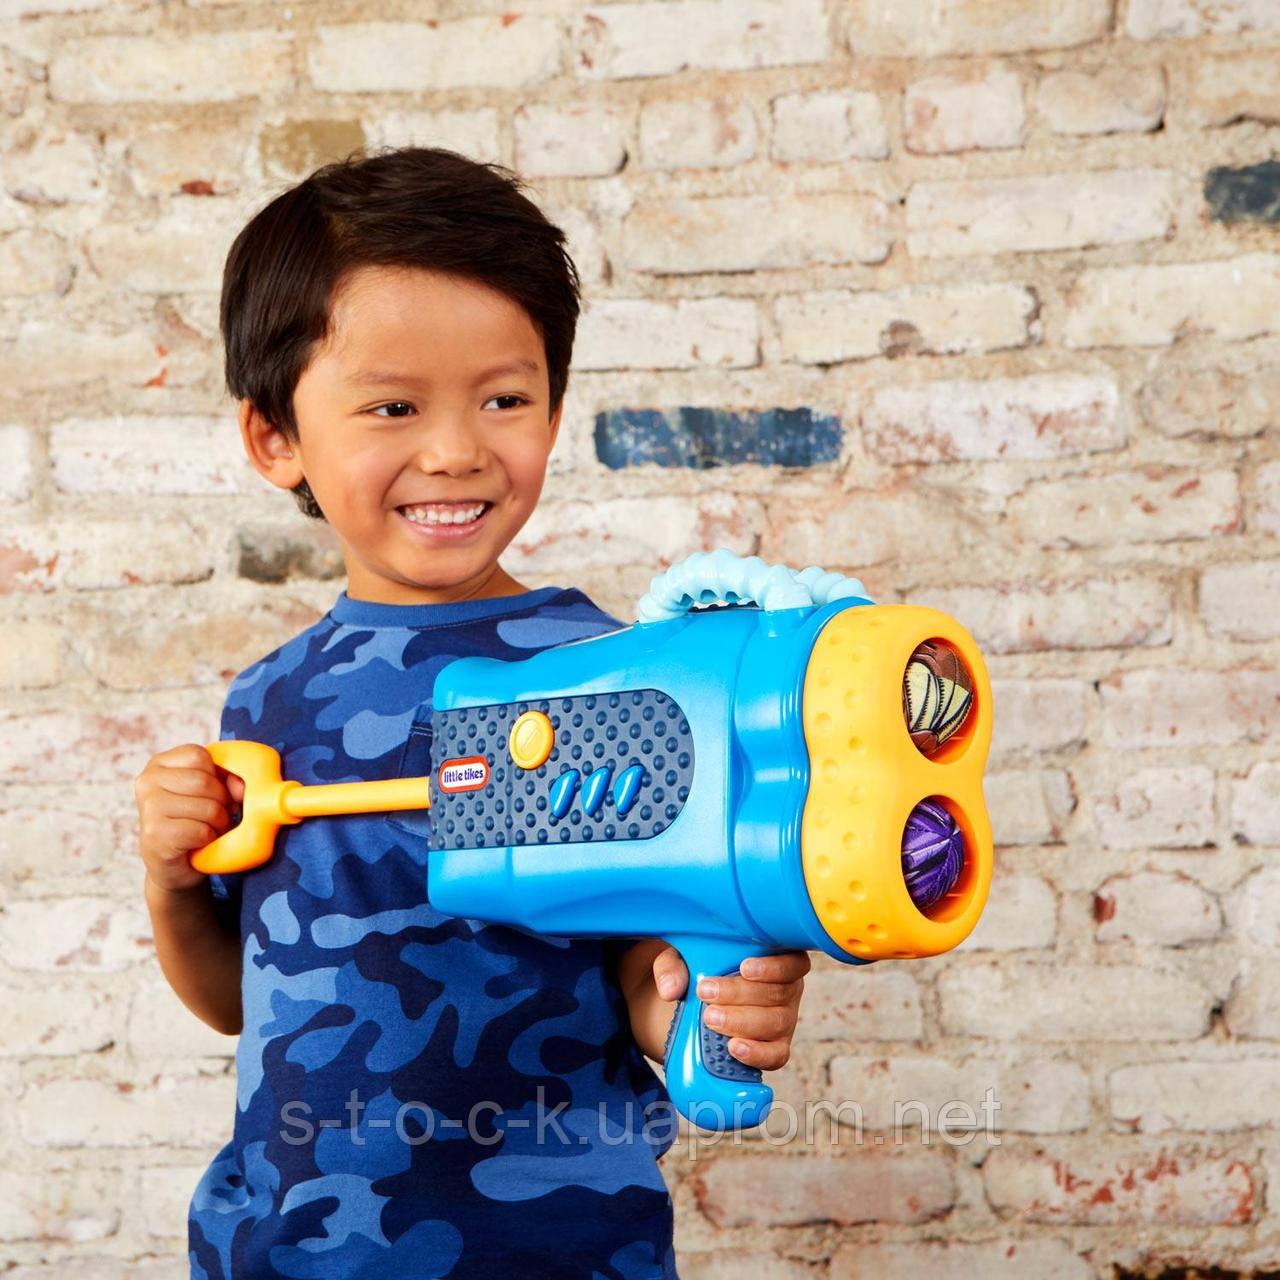 Little Tikes! Двойной игрушечный бластер Mighty Blasters с 6 мягкими мячиками от Little Tikes